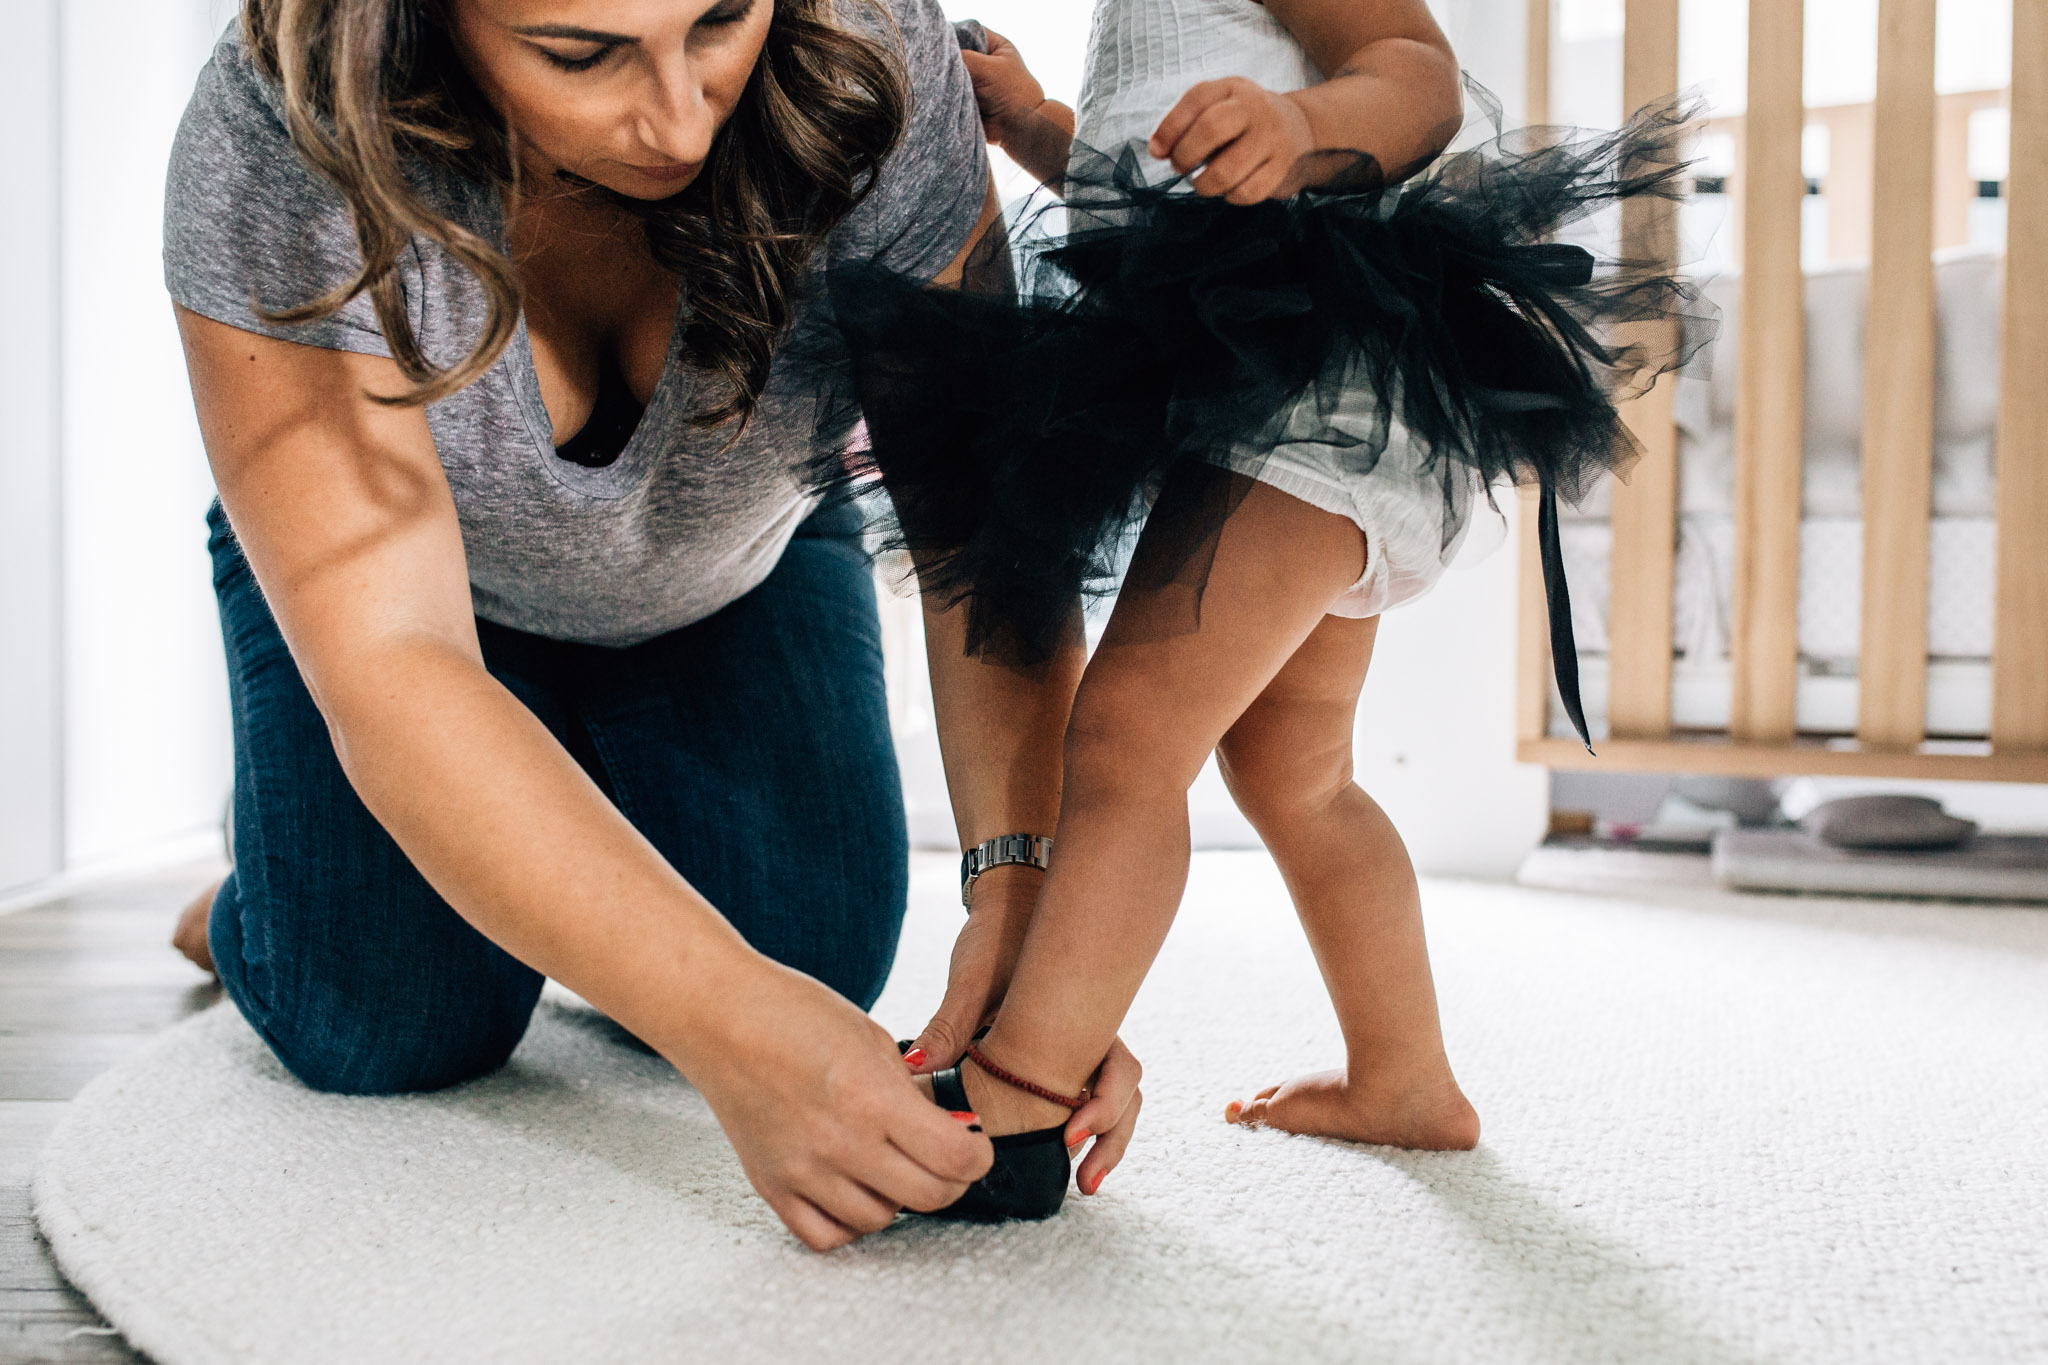 mother fixing toddler girls shoe while she wears tutu (1 of 1).jpg